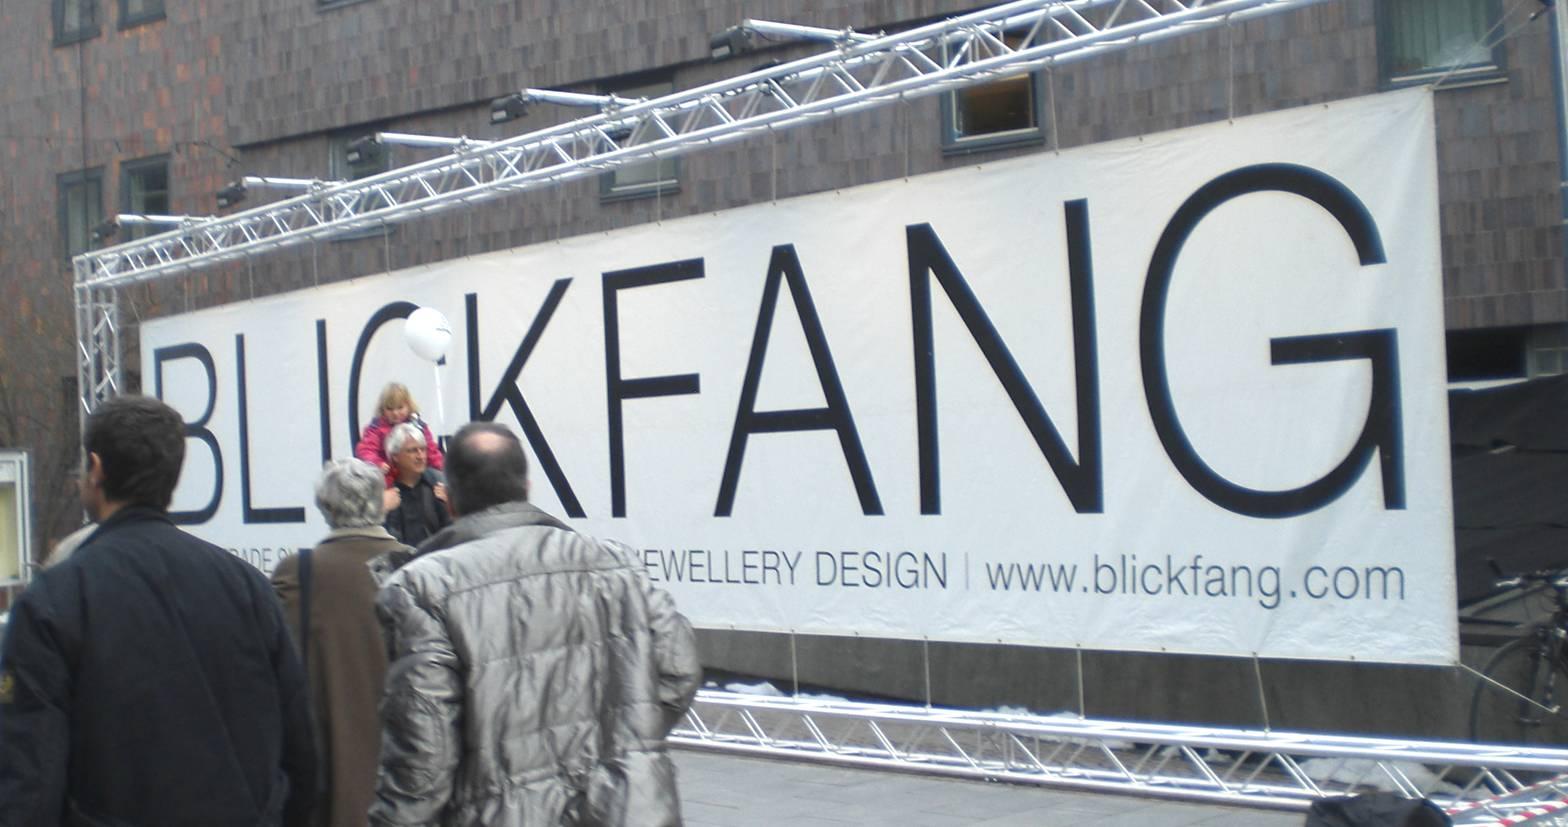 blickfang r ckblick kessel tv. Black Bedroom Furniture Sets. Home Design Ideas